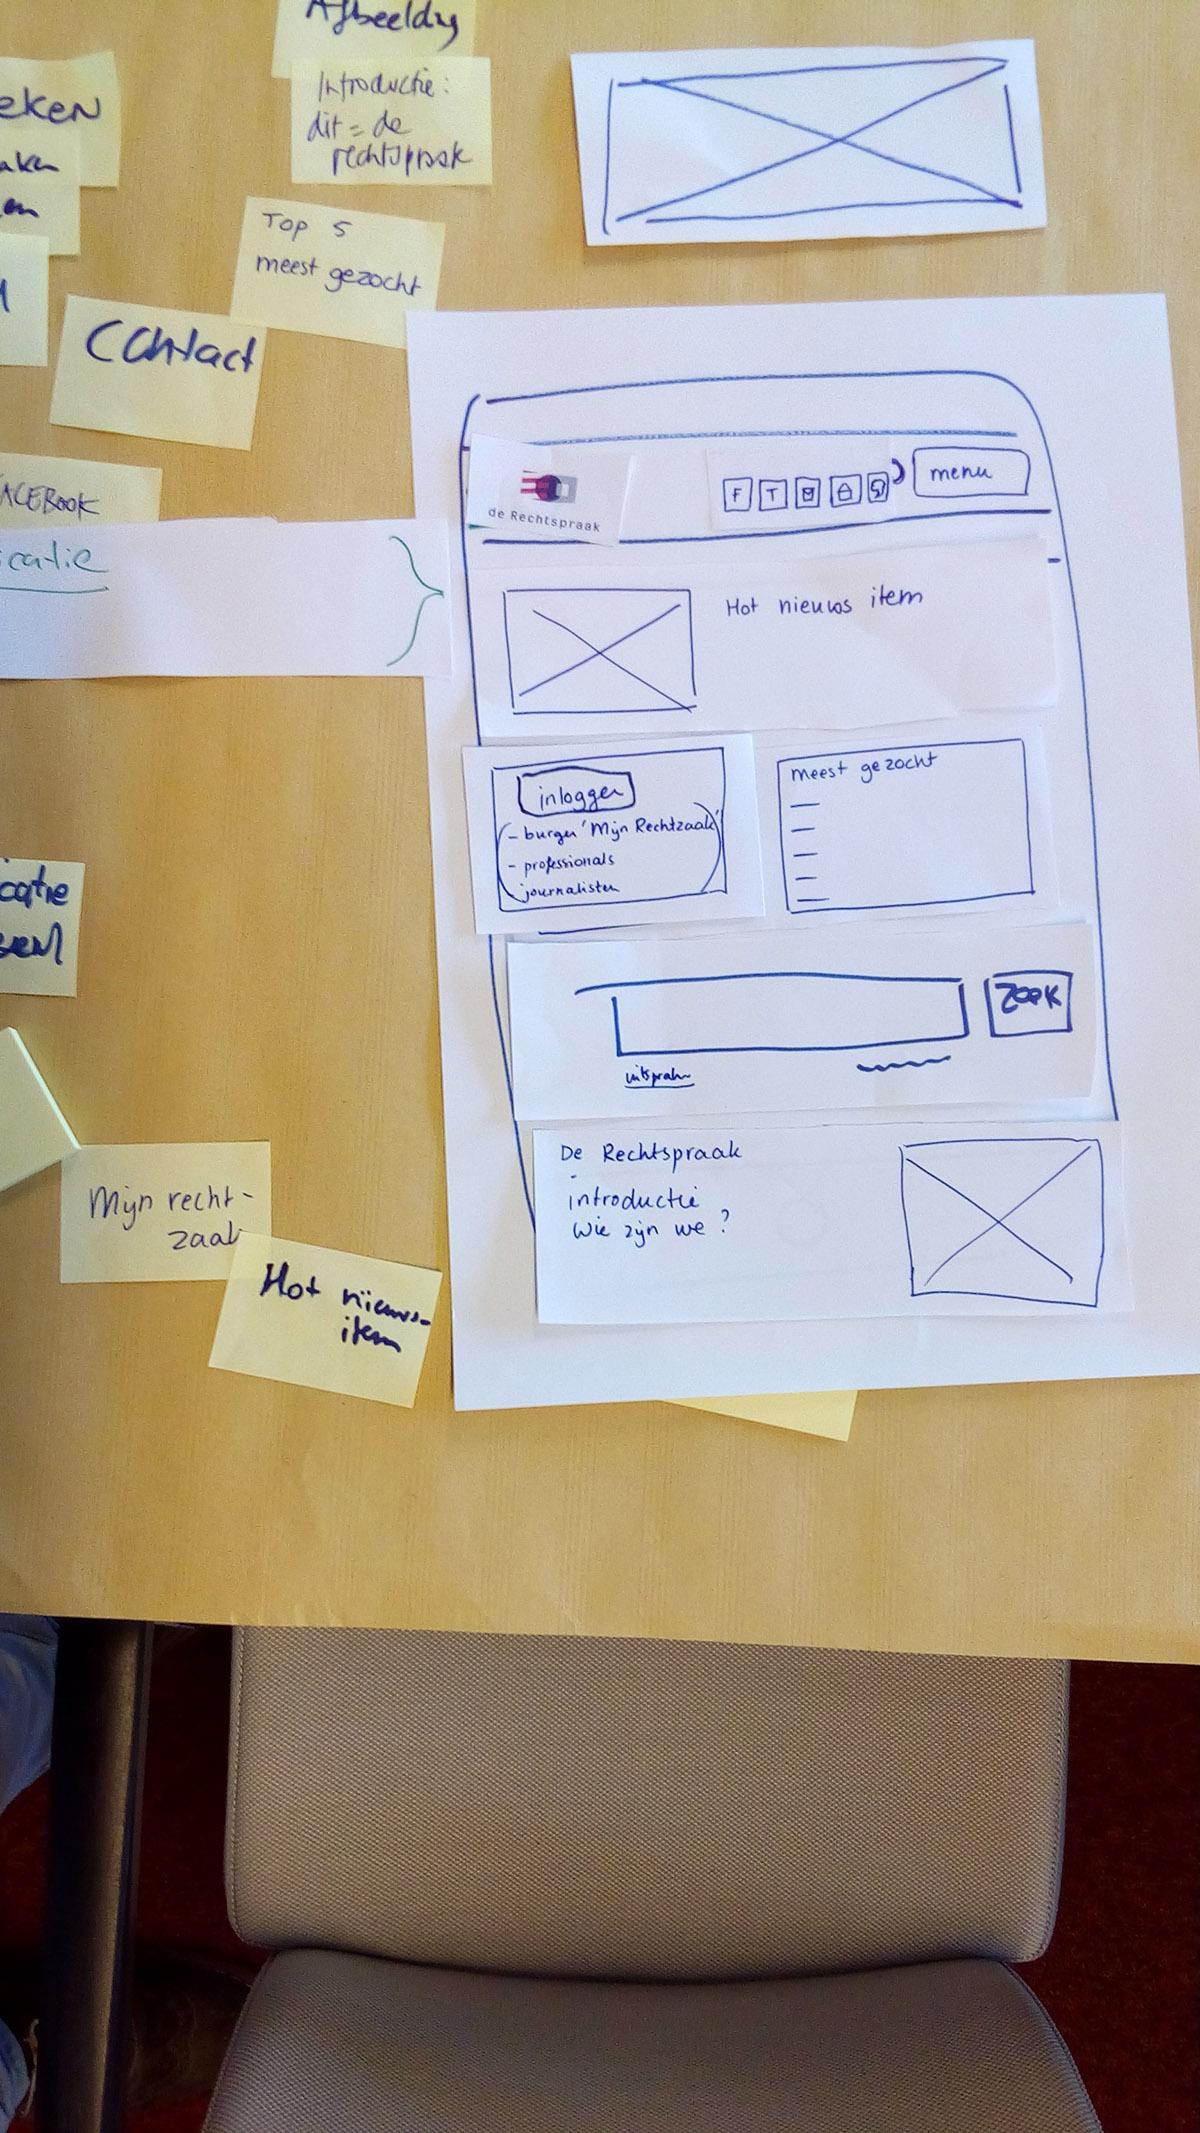 prototytping wireframing paper prototype Rapid Prototyping